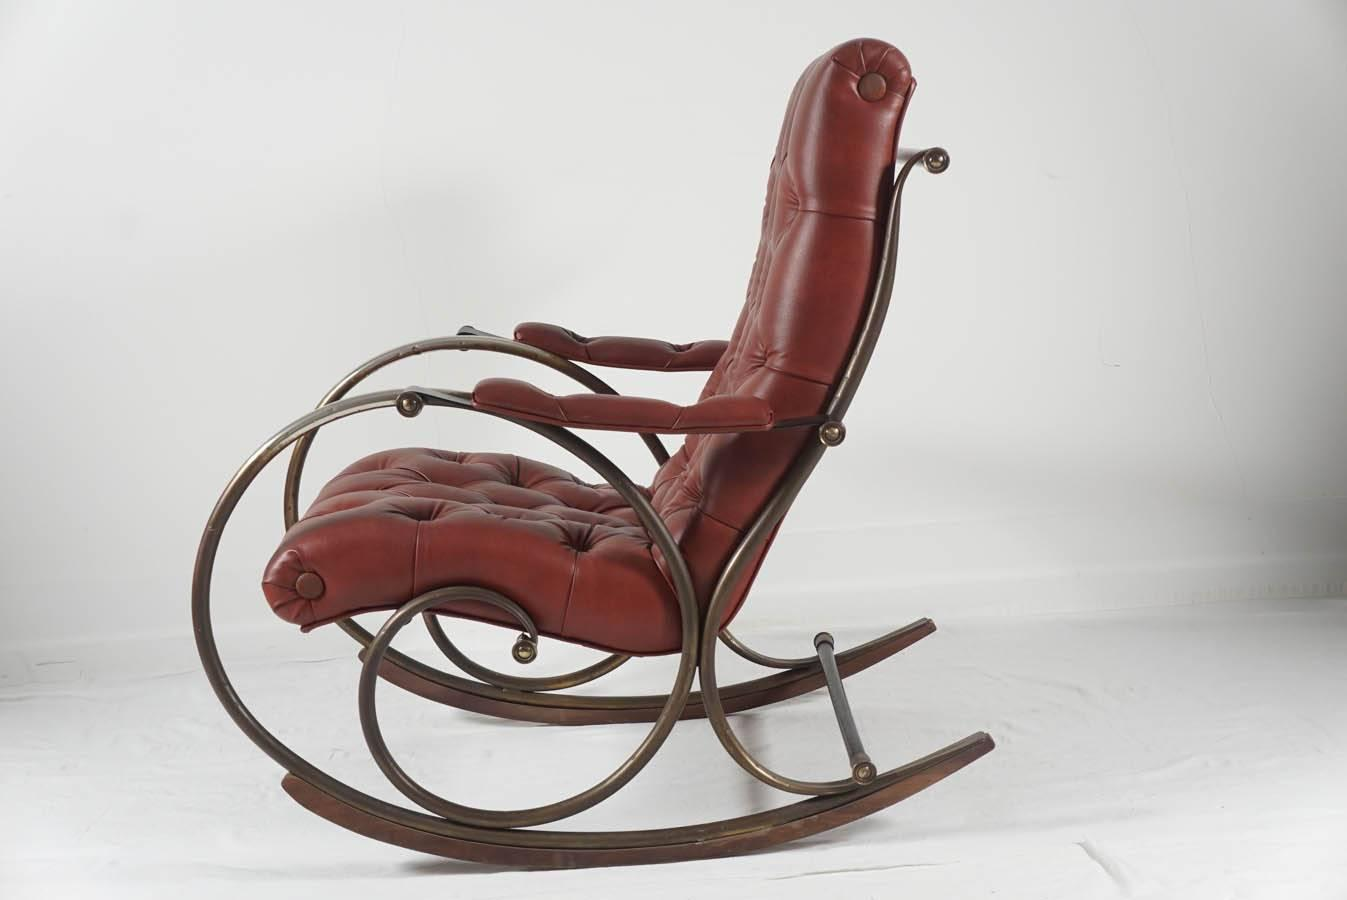 mid century rocker chair wayfair chaise lounge chairs lee woodard rocking at 1stdibs